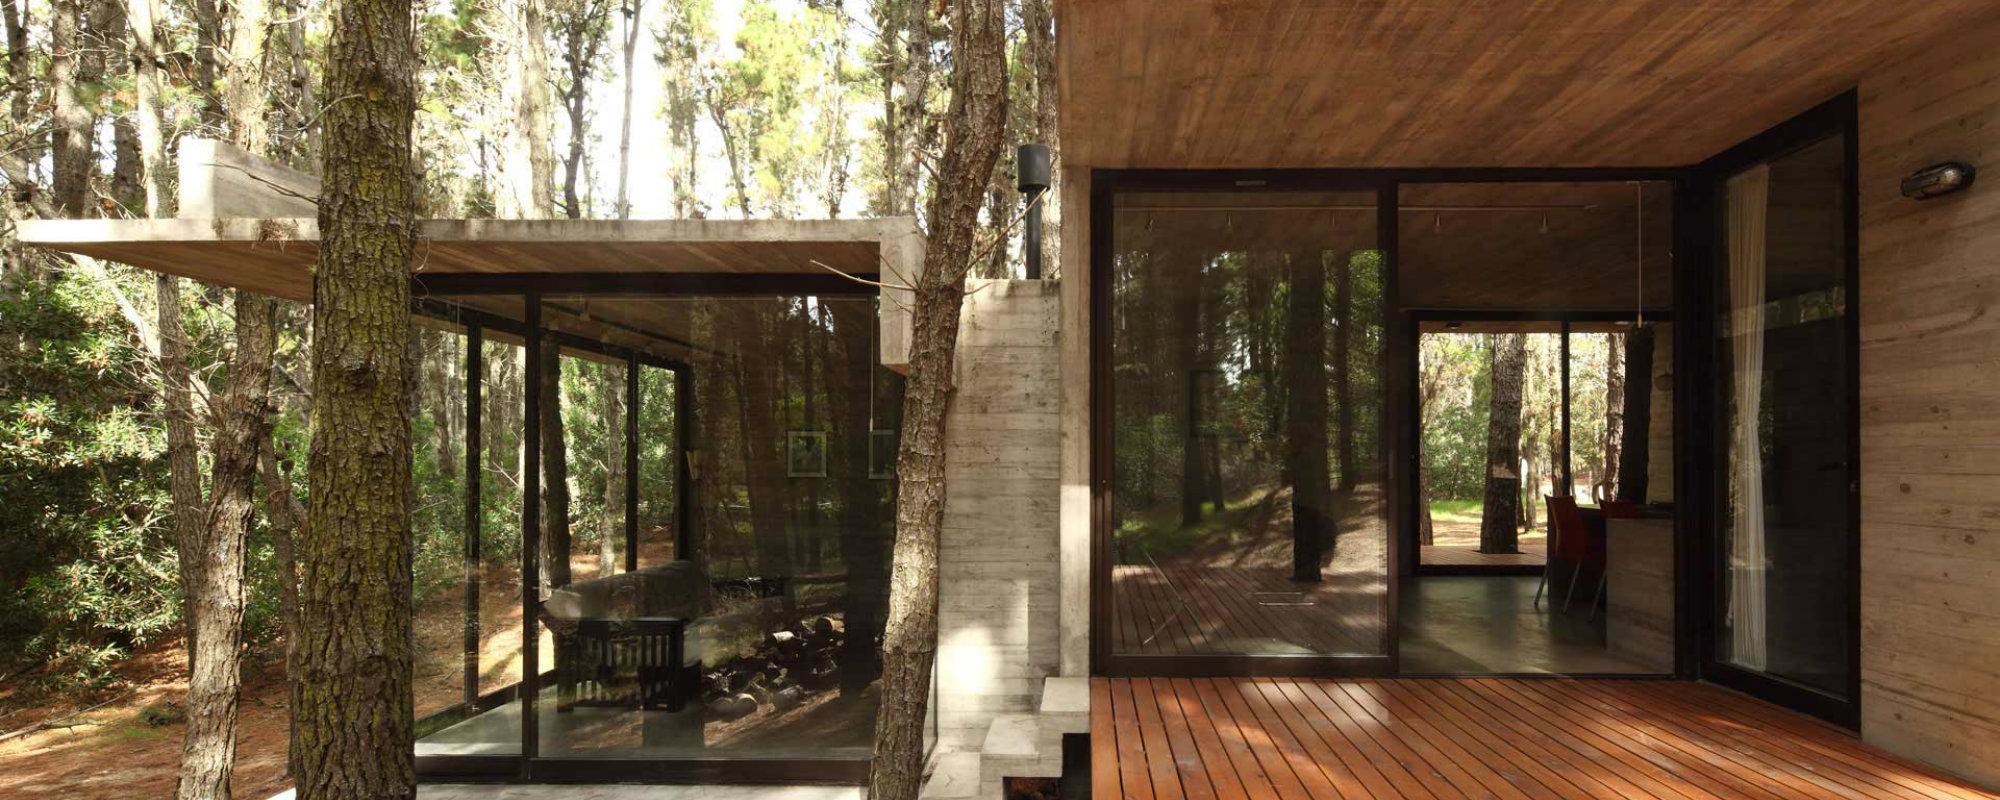 Arquitectura Argentina: Besonias Almeida con proyectos lujuosos y estupendos arquitectura argentina Arquitectura Argentina: Besonias Almeida con proyectos lujuosos y estupendos Featured 13